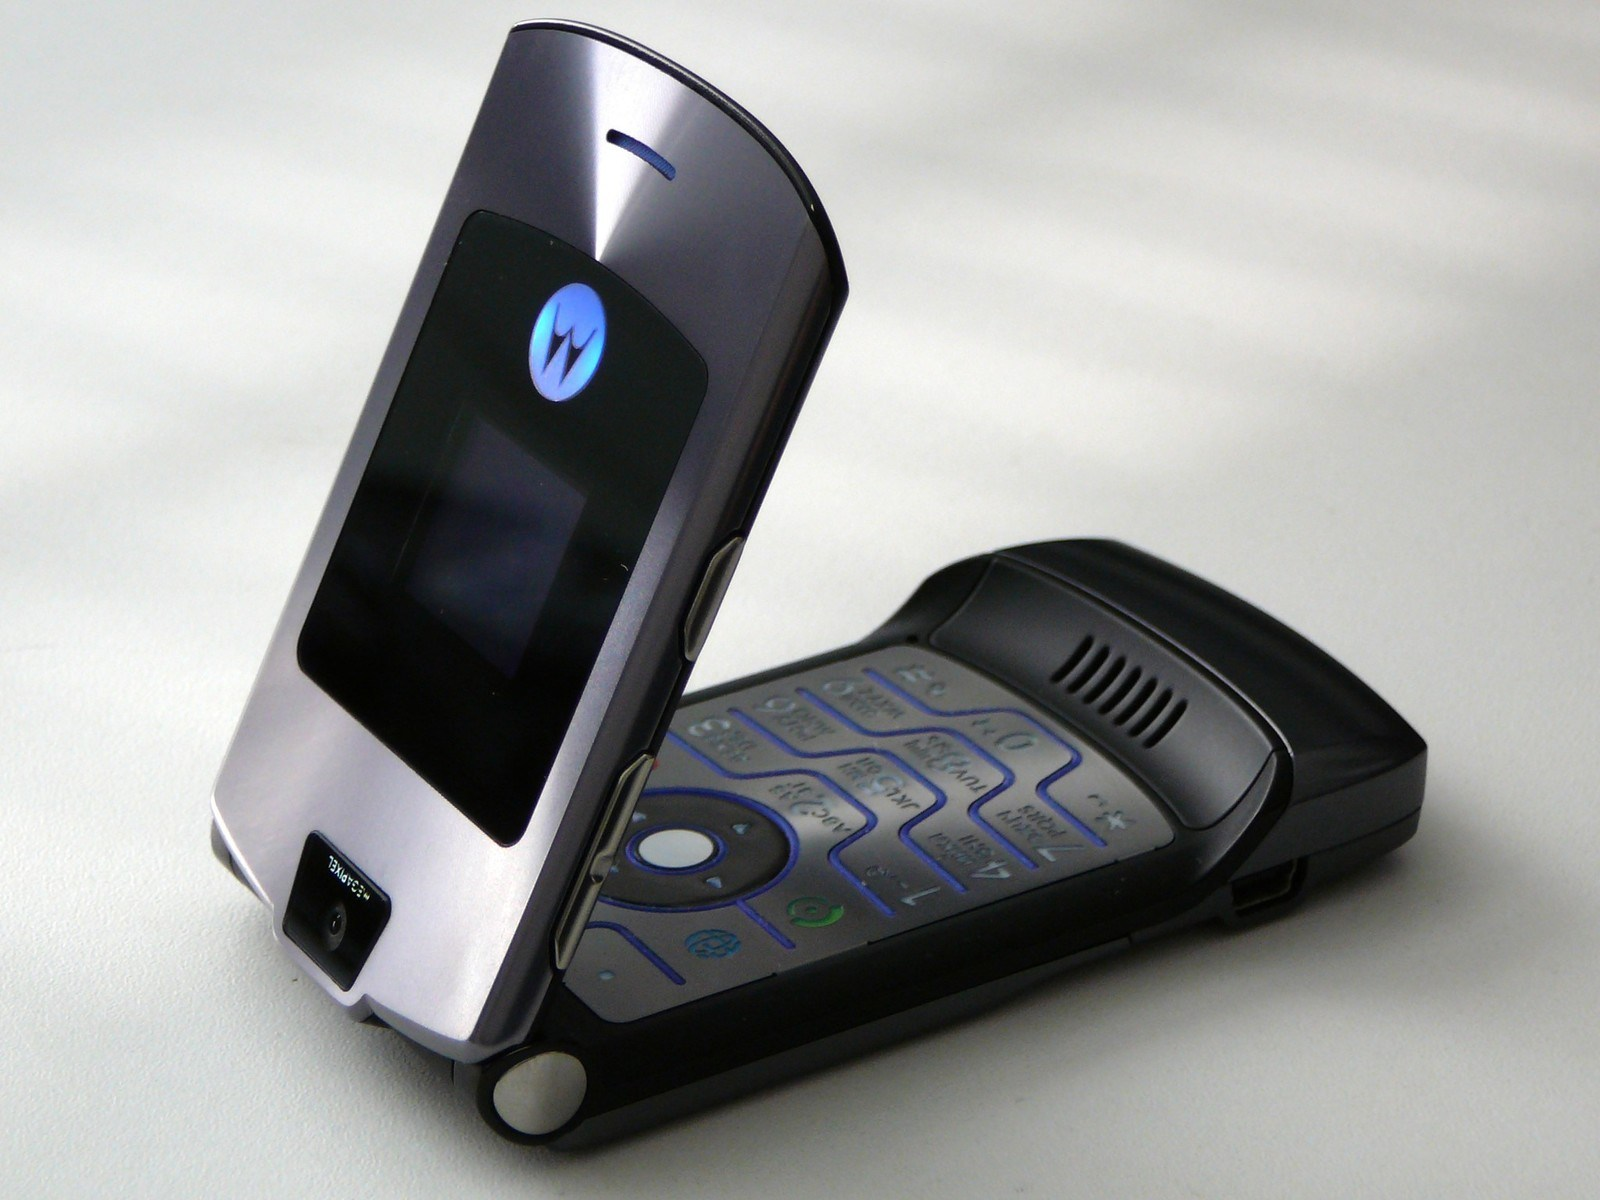 Motorola va aussi sortir son smartphone pliable, avec une dose de nostalgie – MWC 2019